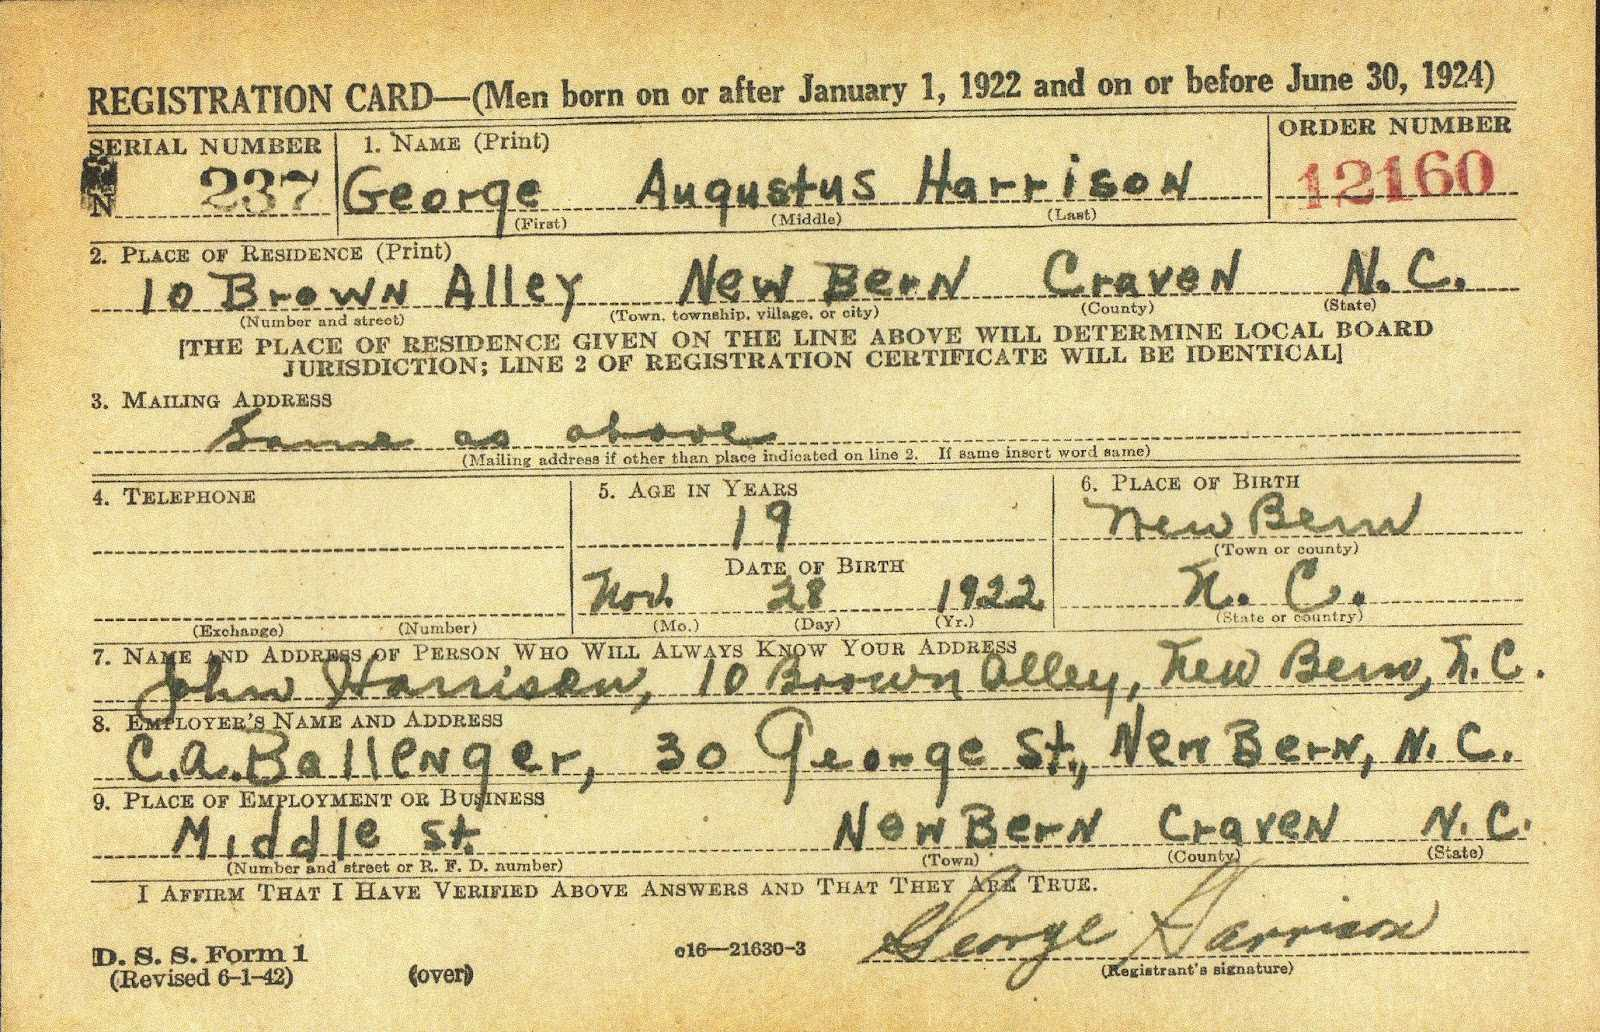 World War 2 Identity Card Template ] - Replica Of A World Within World War 2 Identity Card Template